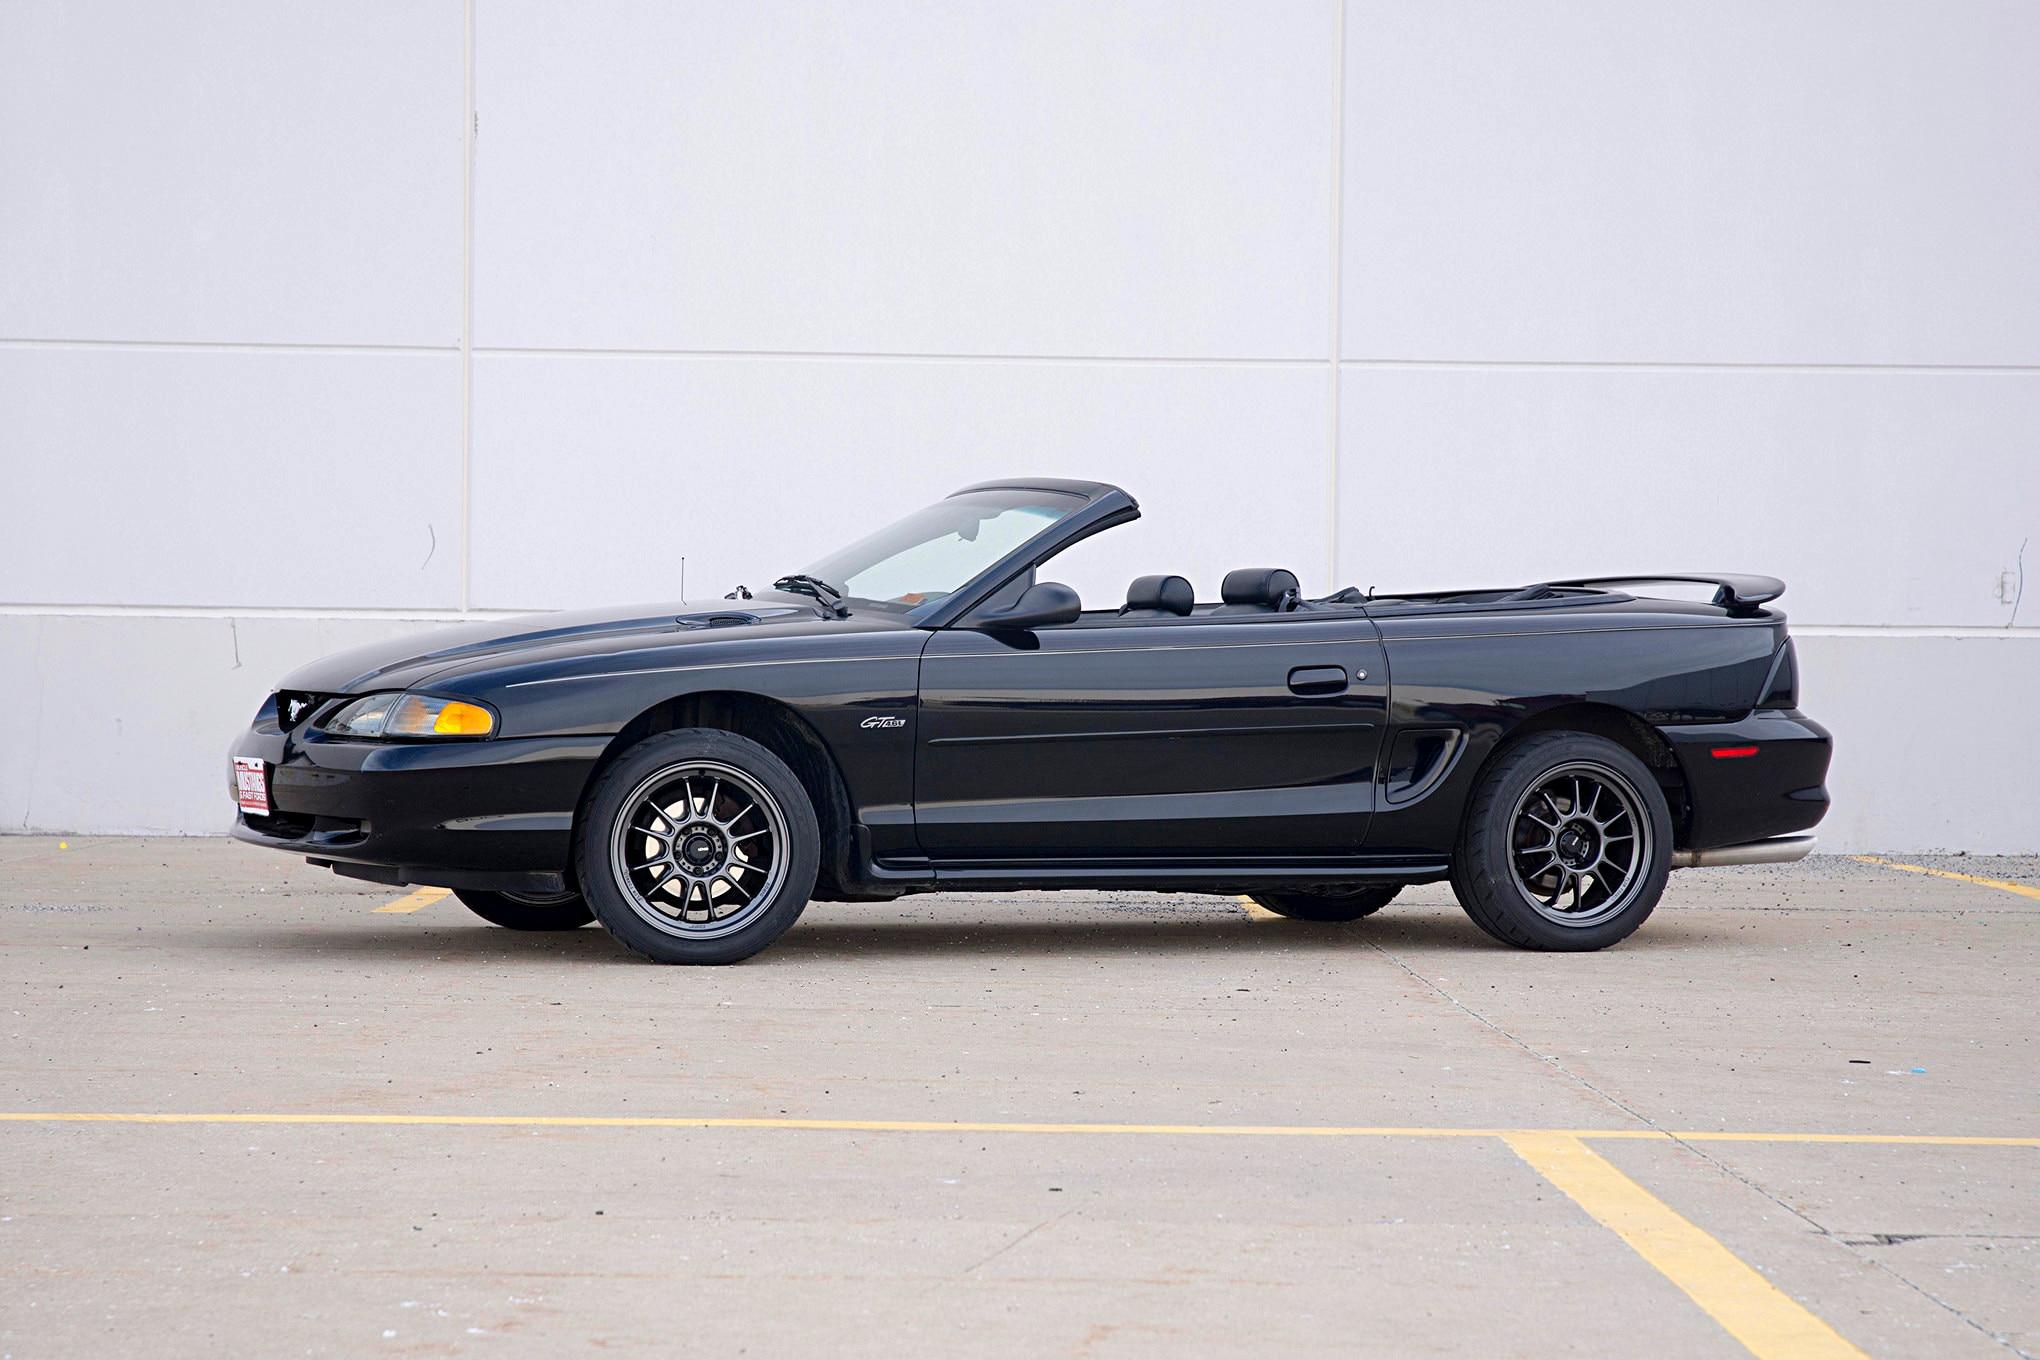 001 1997 Mustang Convertible Koenig Hypergram Wheels